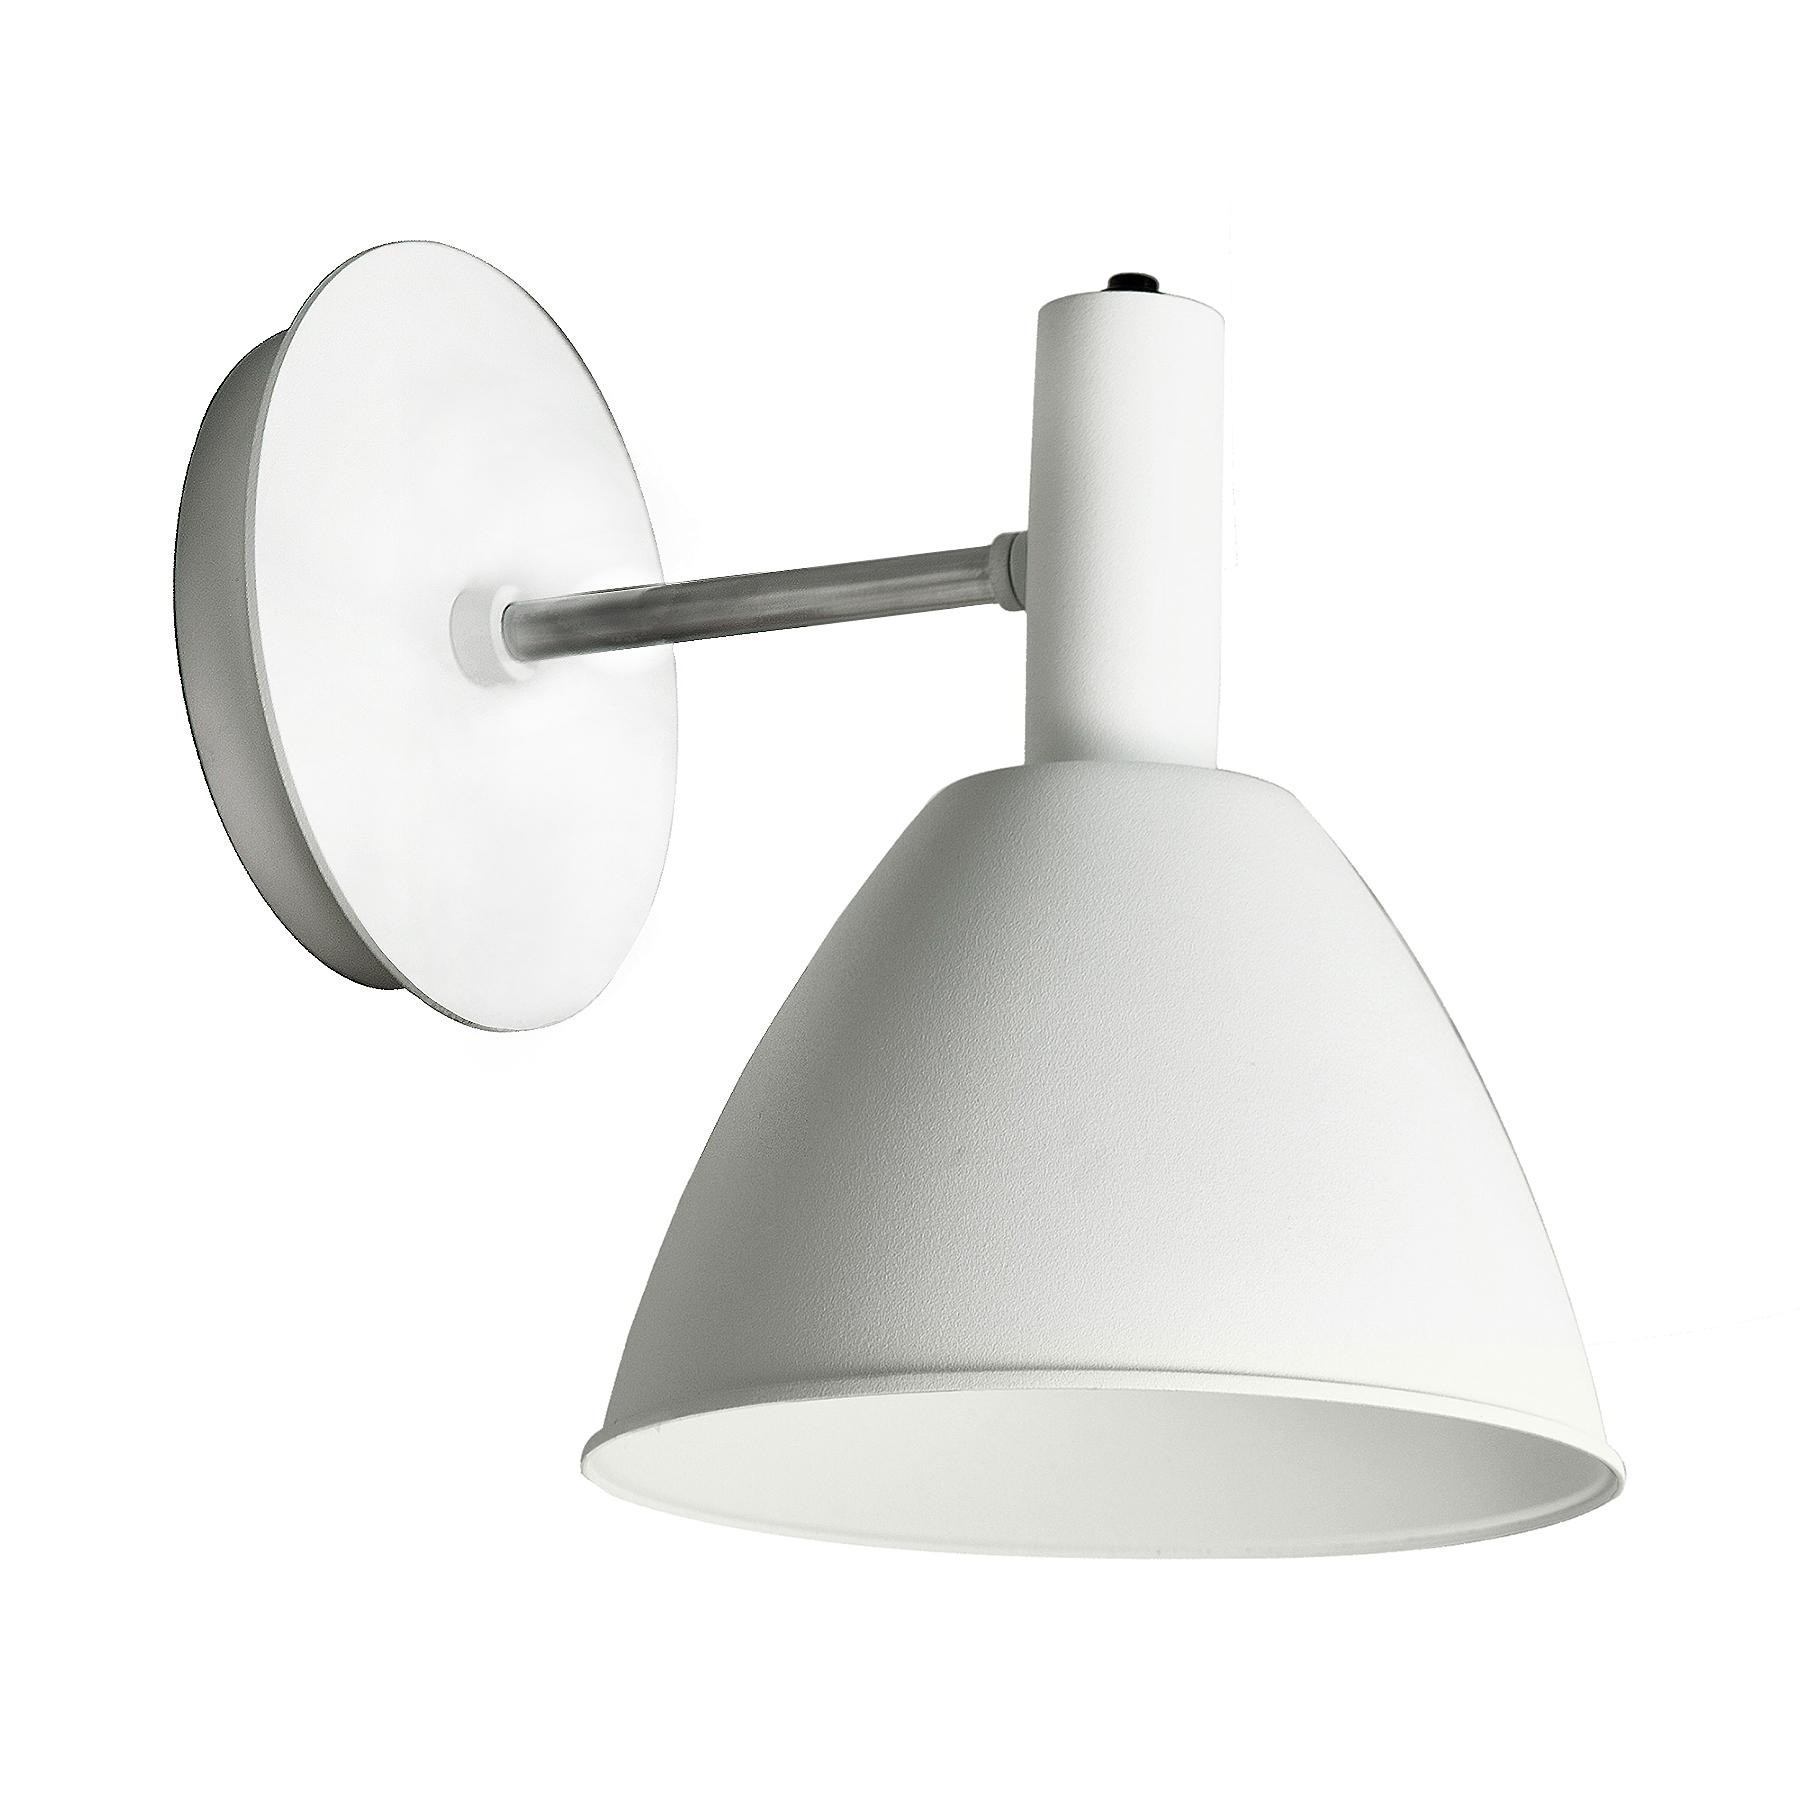 Lampara De Pared Led Mini Bauhaus 90 W1